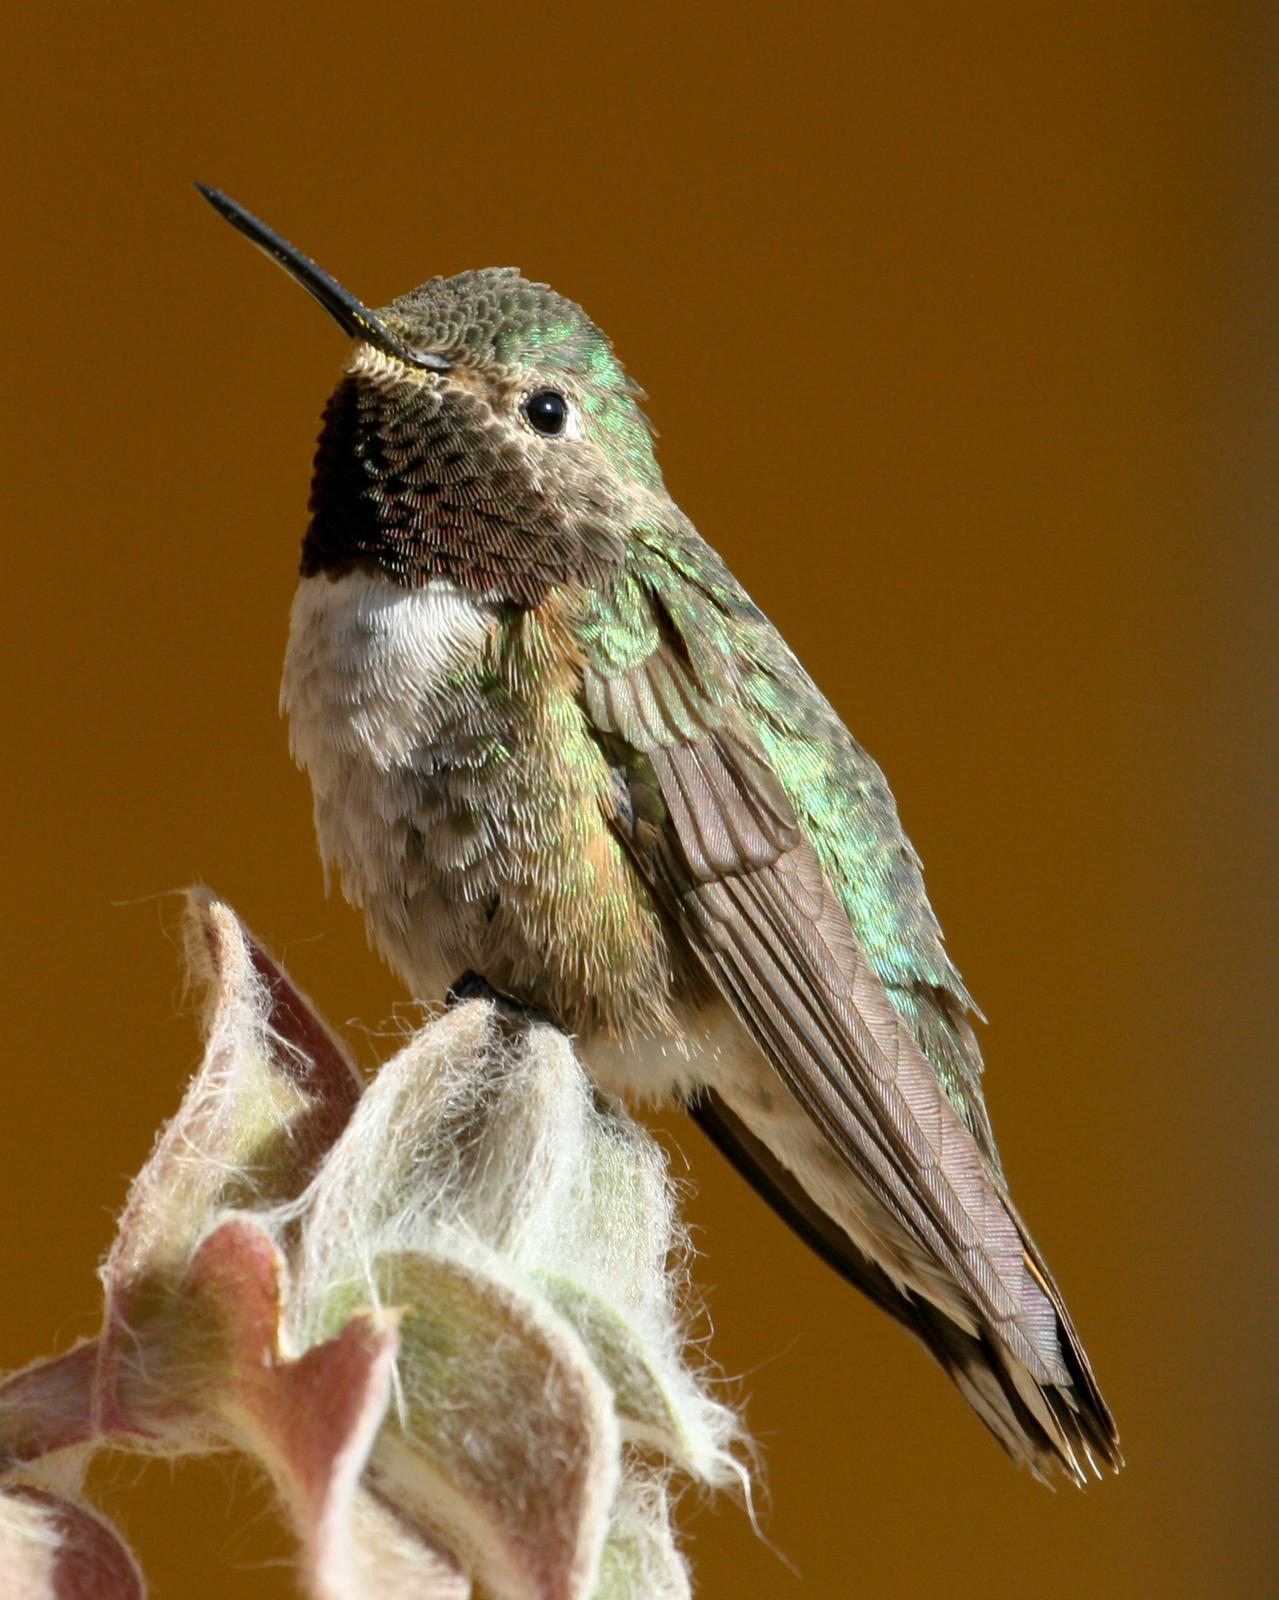 Broad-tailed Hummingbird Photo by Nathan Renn